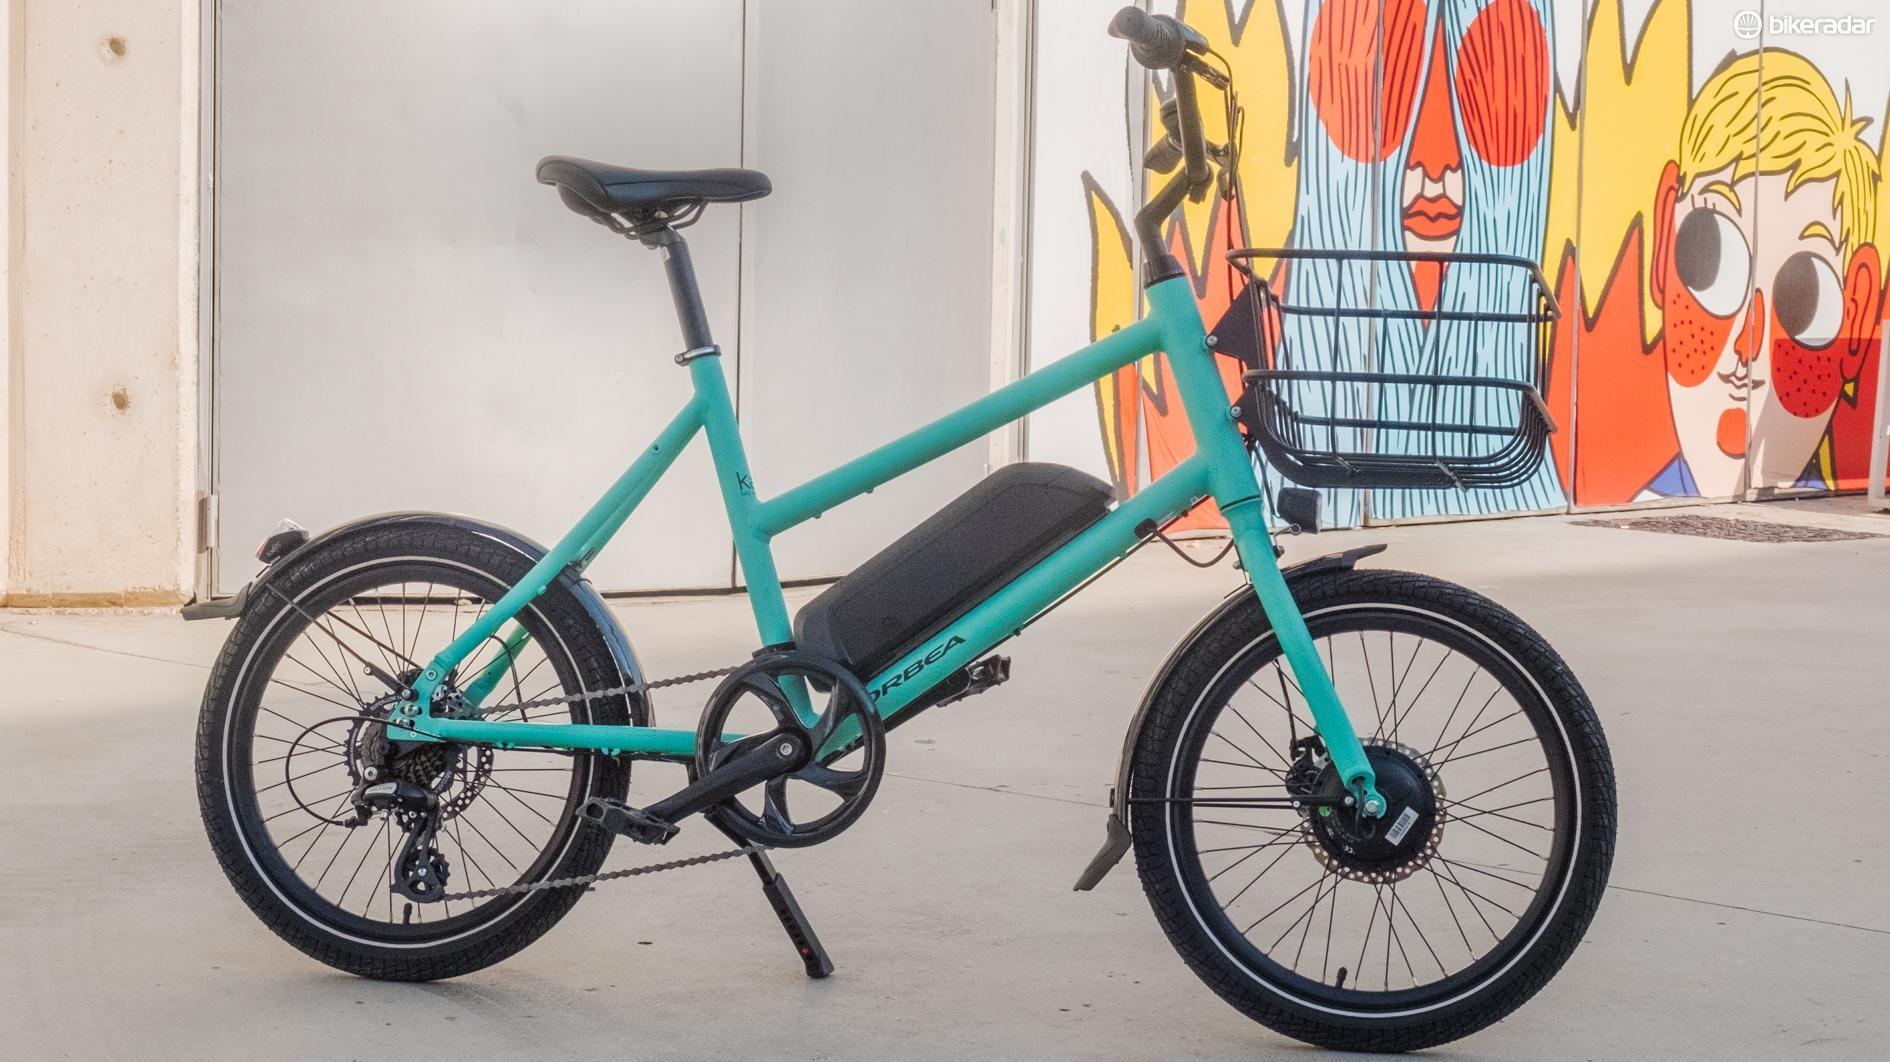 The Orbea E-Katu is a dinky, versatile utility bike